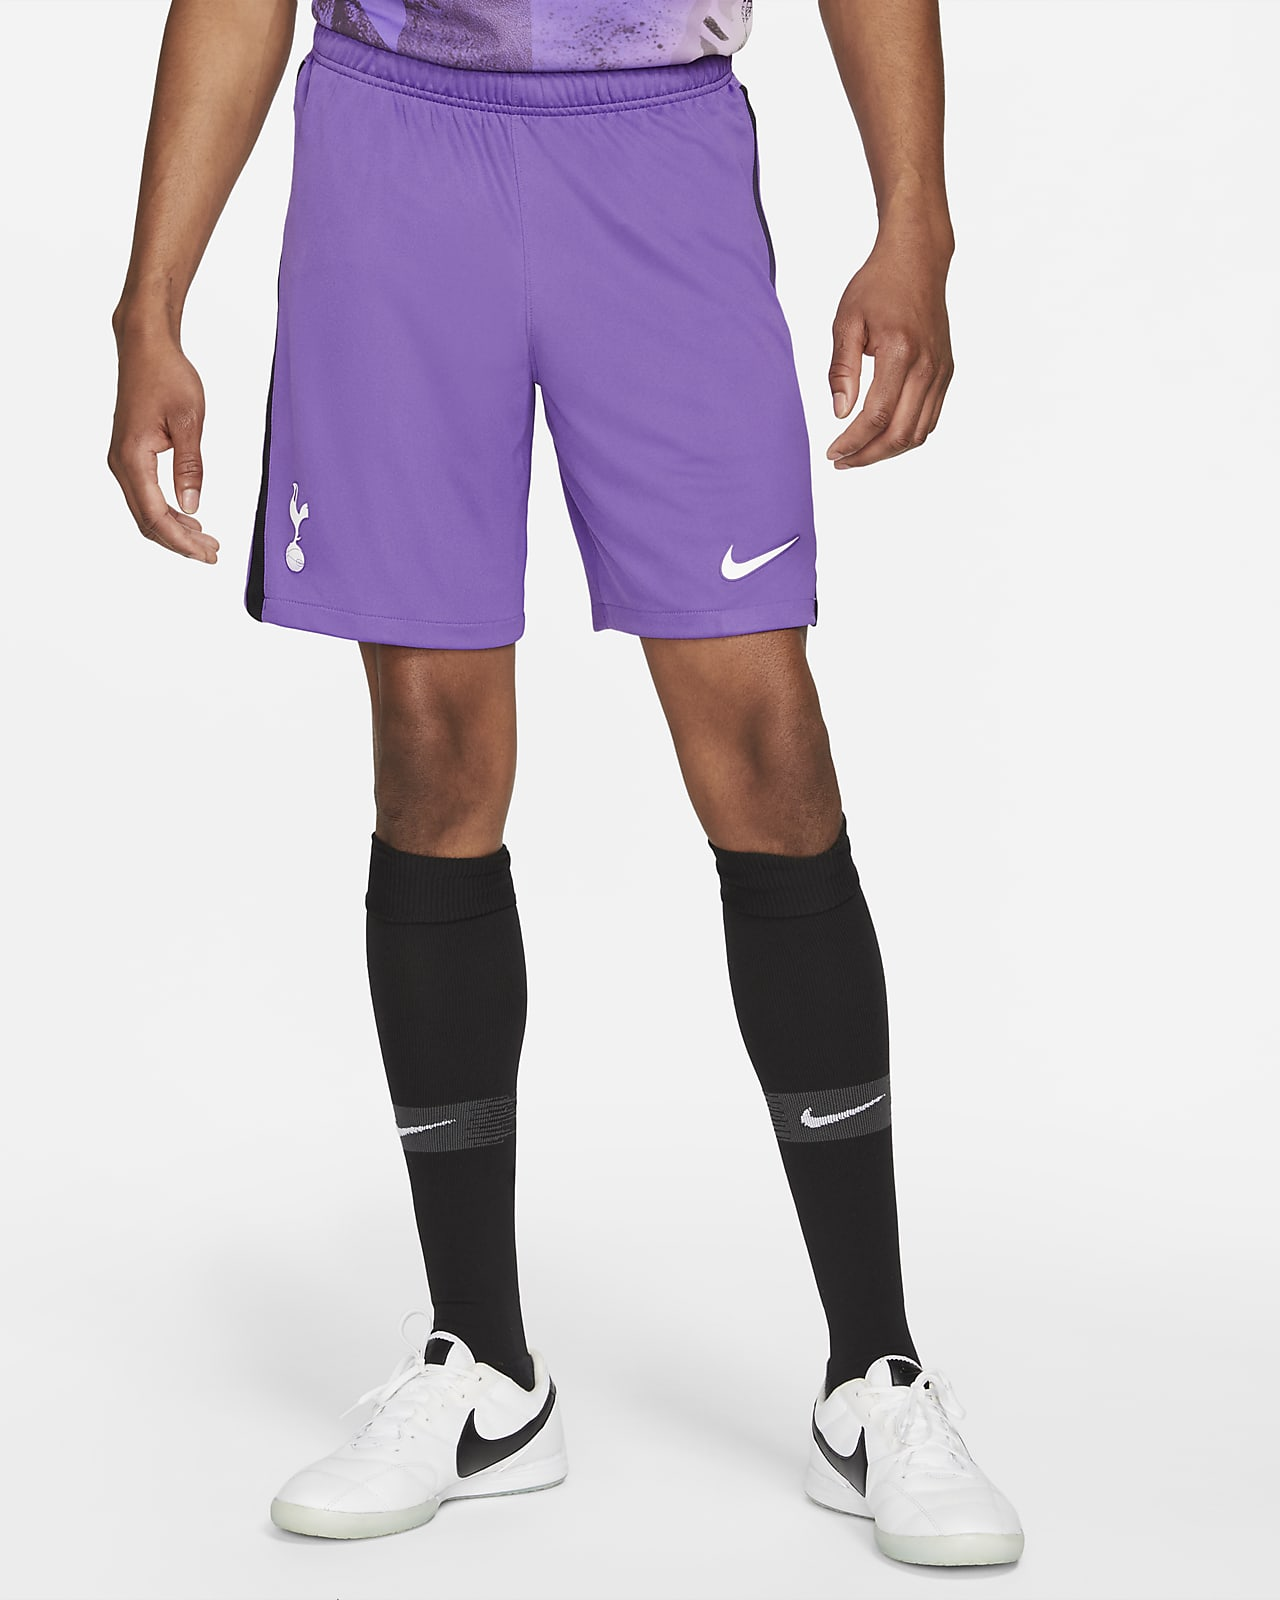 Tottenham Hotspur 2021/22 Stadium Third Men's Nike Dri-FIT Football Shorts